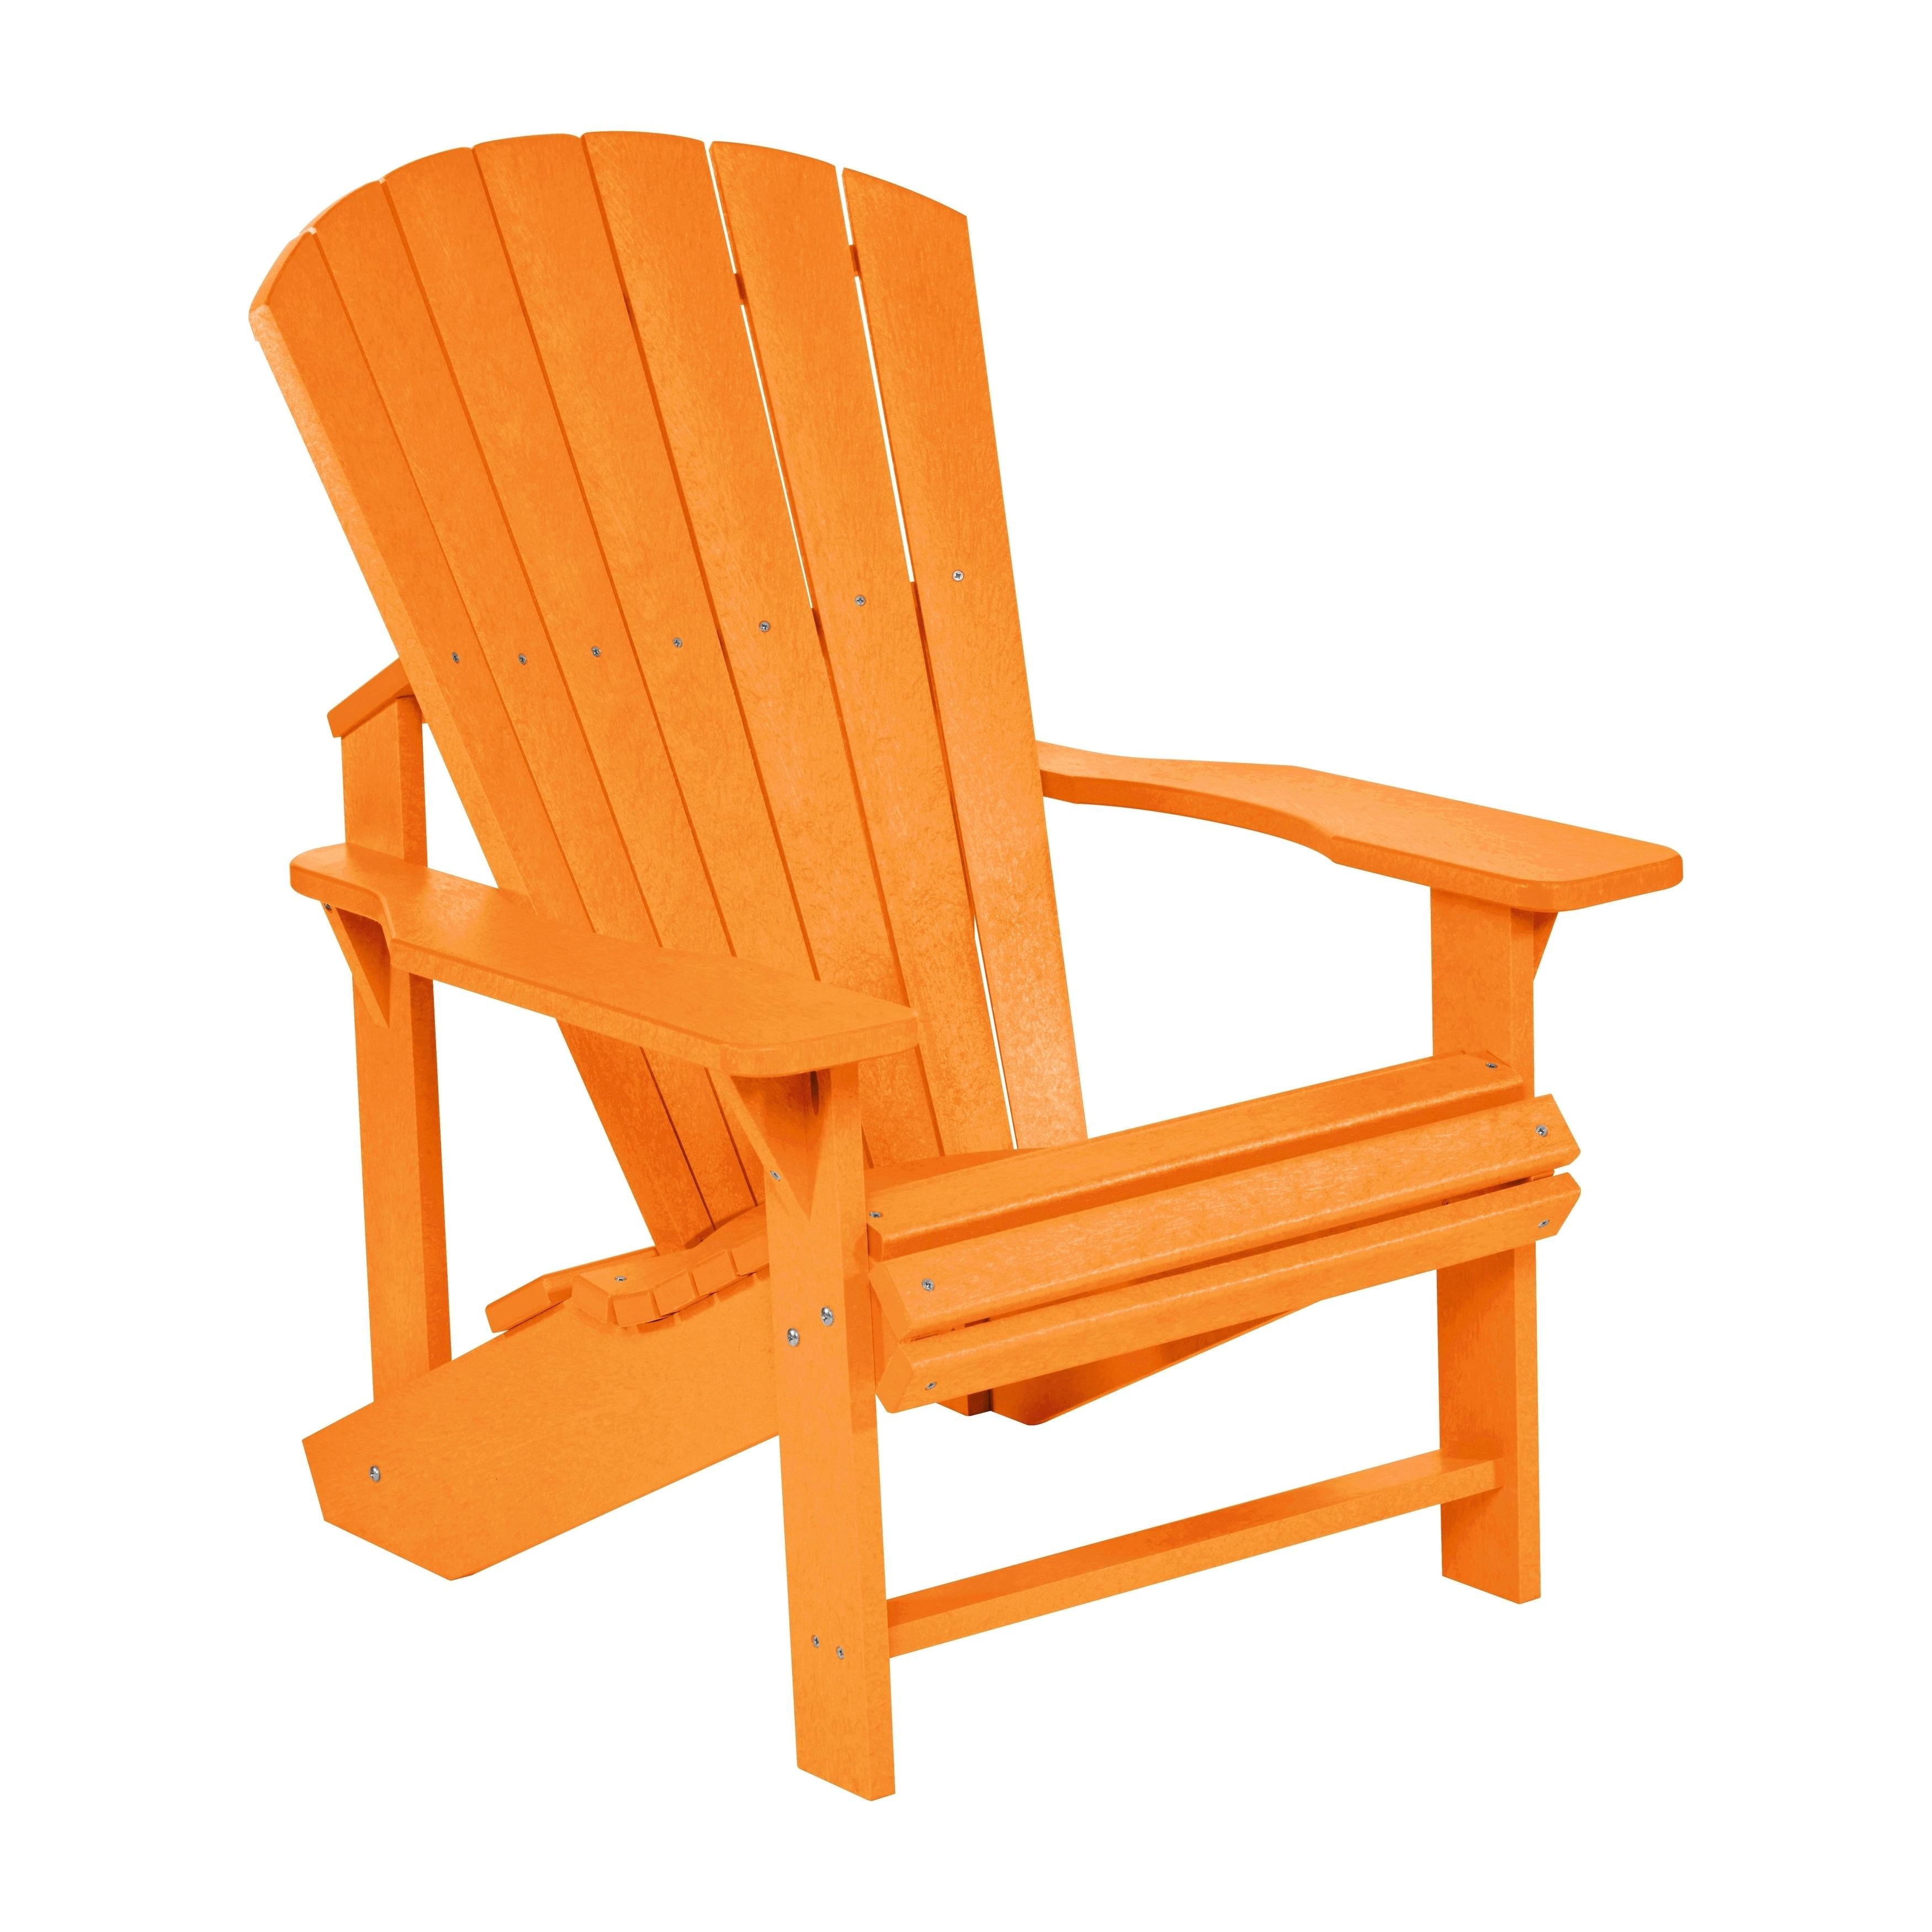 Beau C.R. Plastics Generation Adirondack Chair